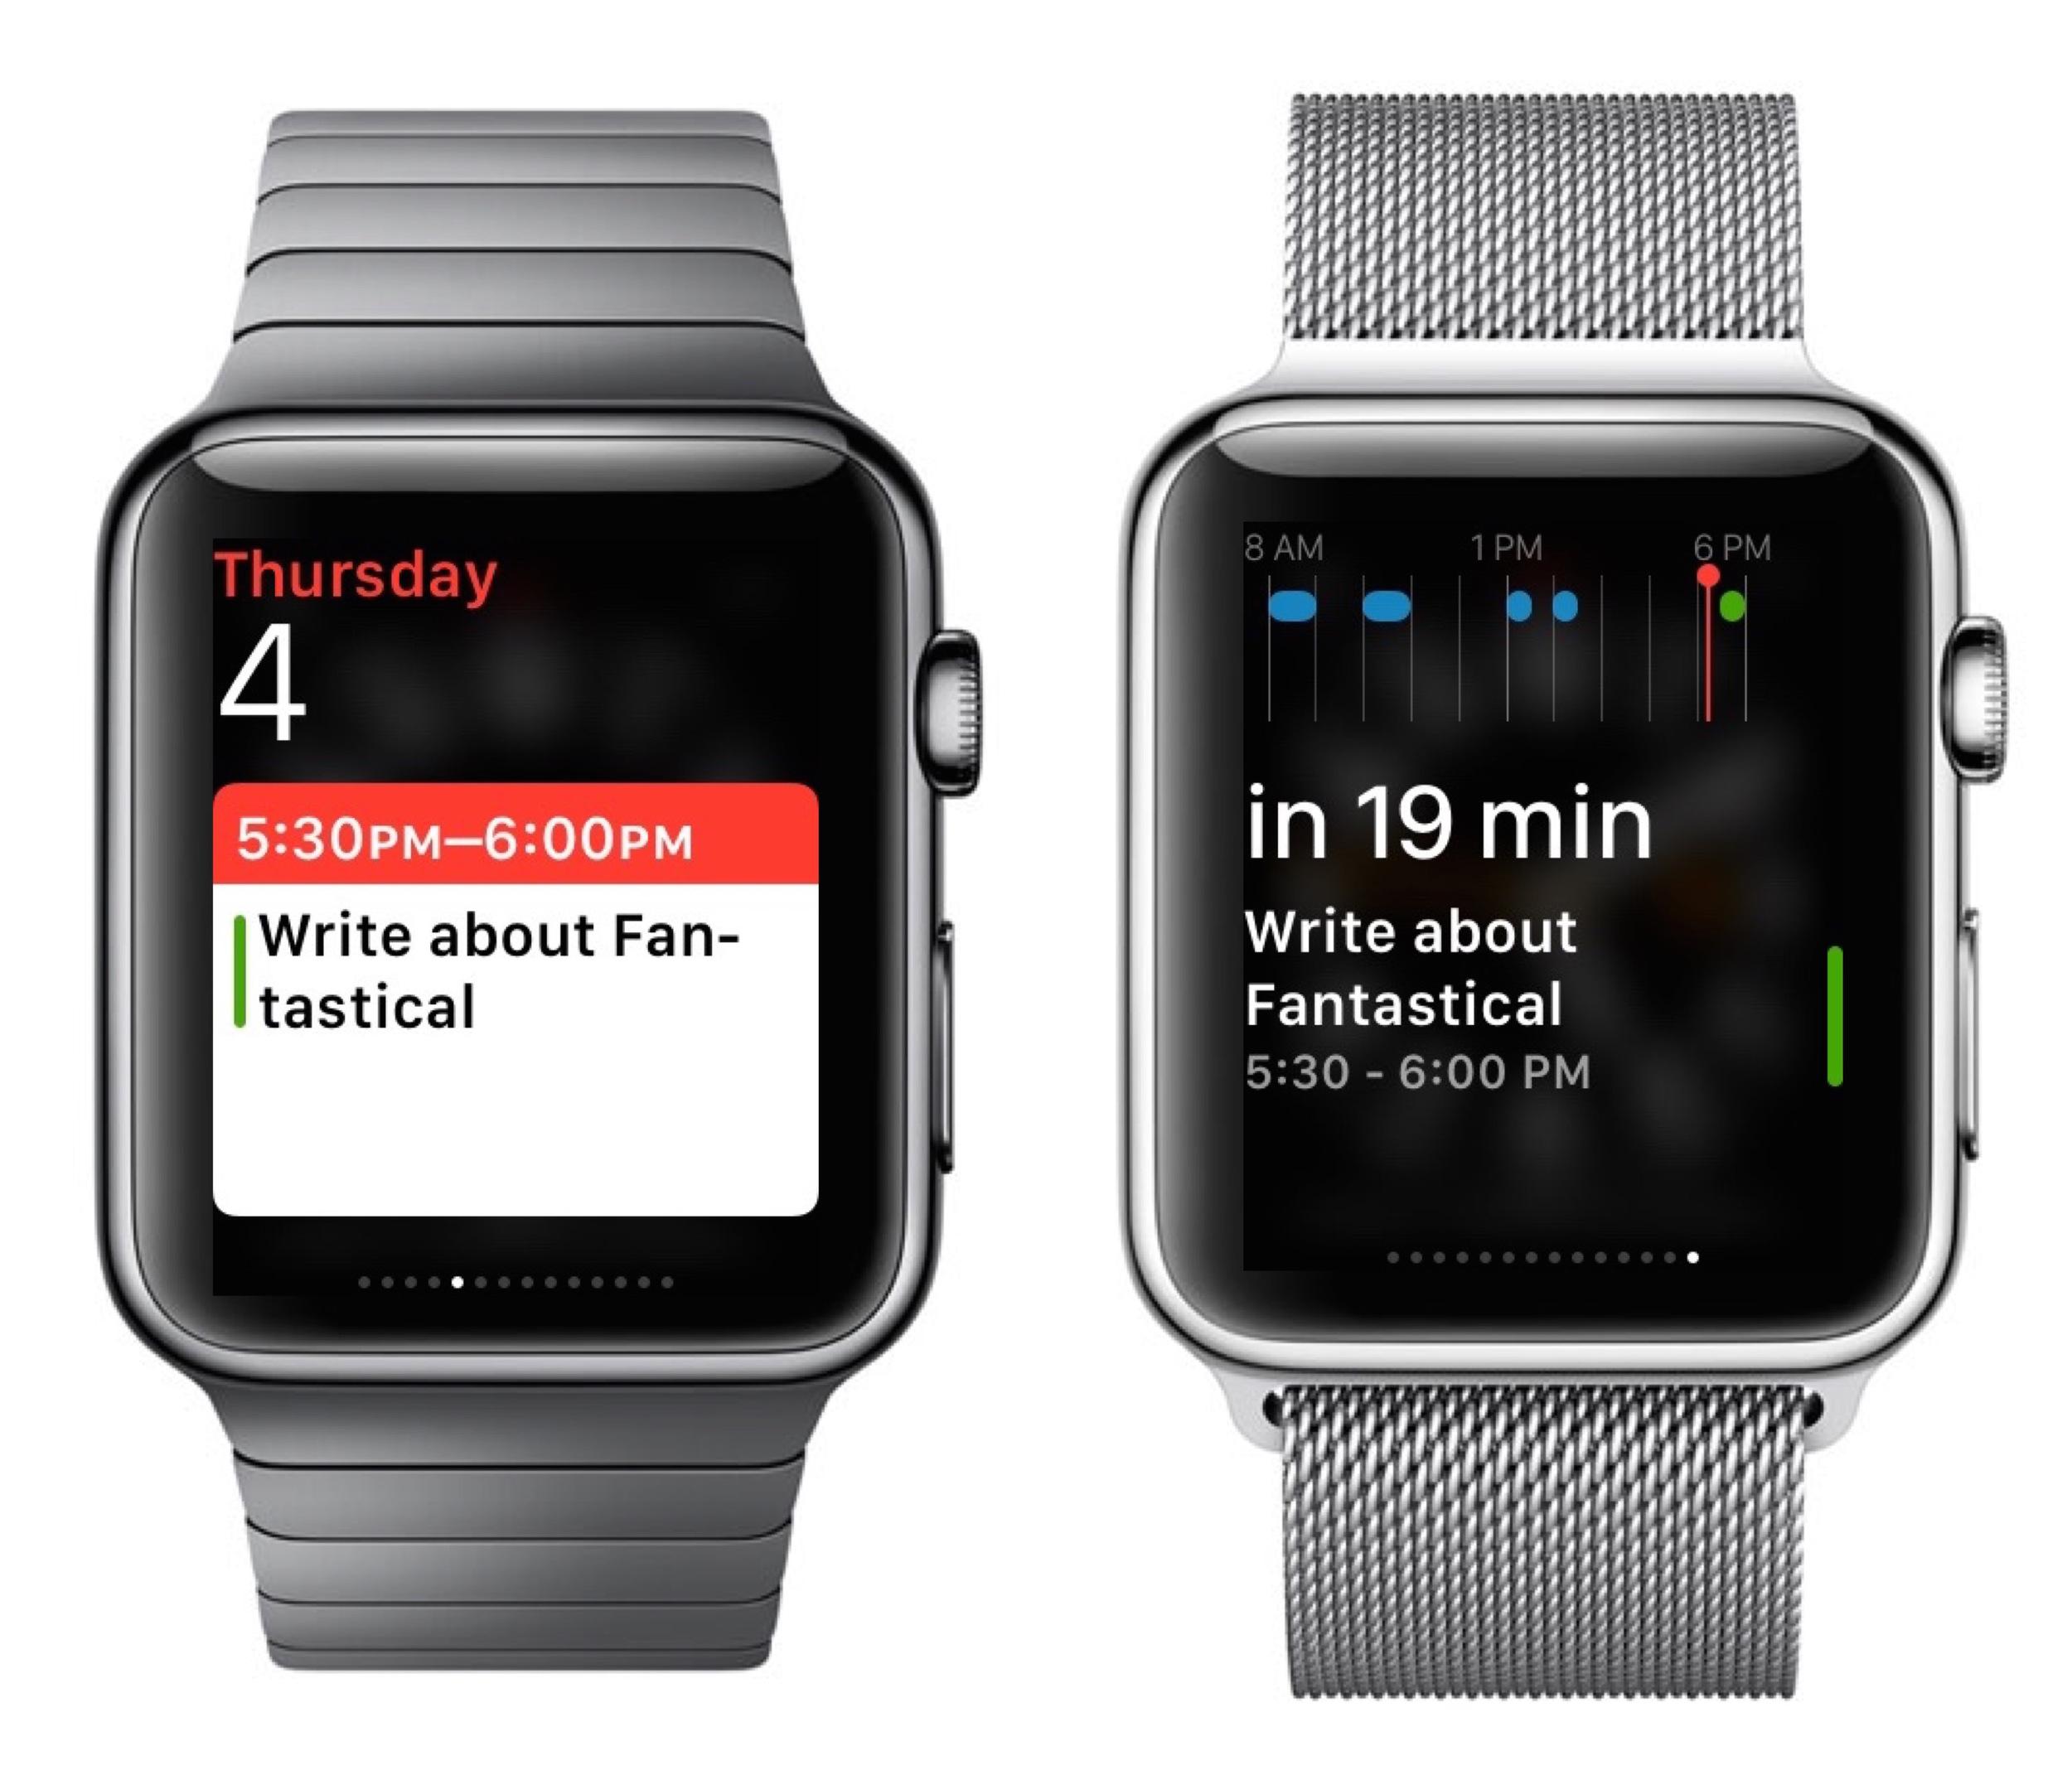 Apple Calendar on left. Fantastical on right.